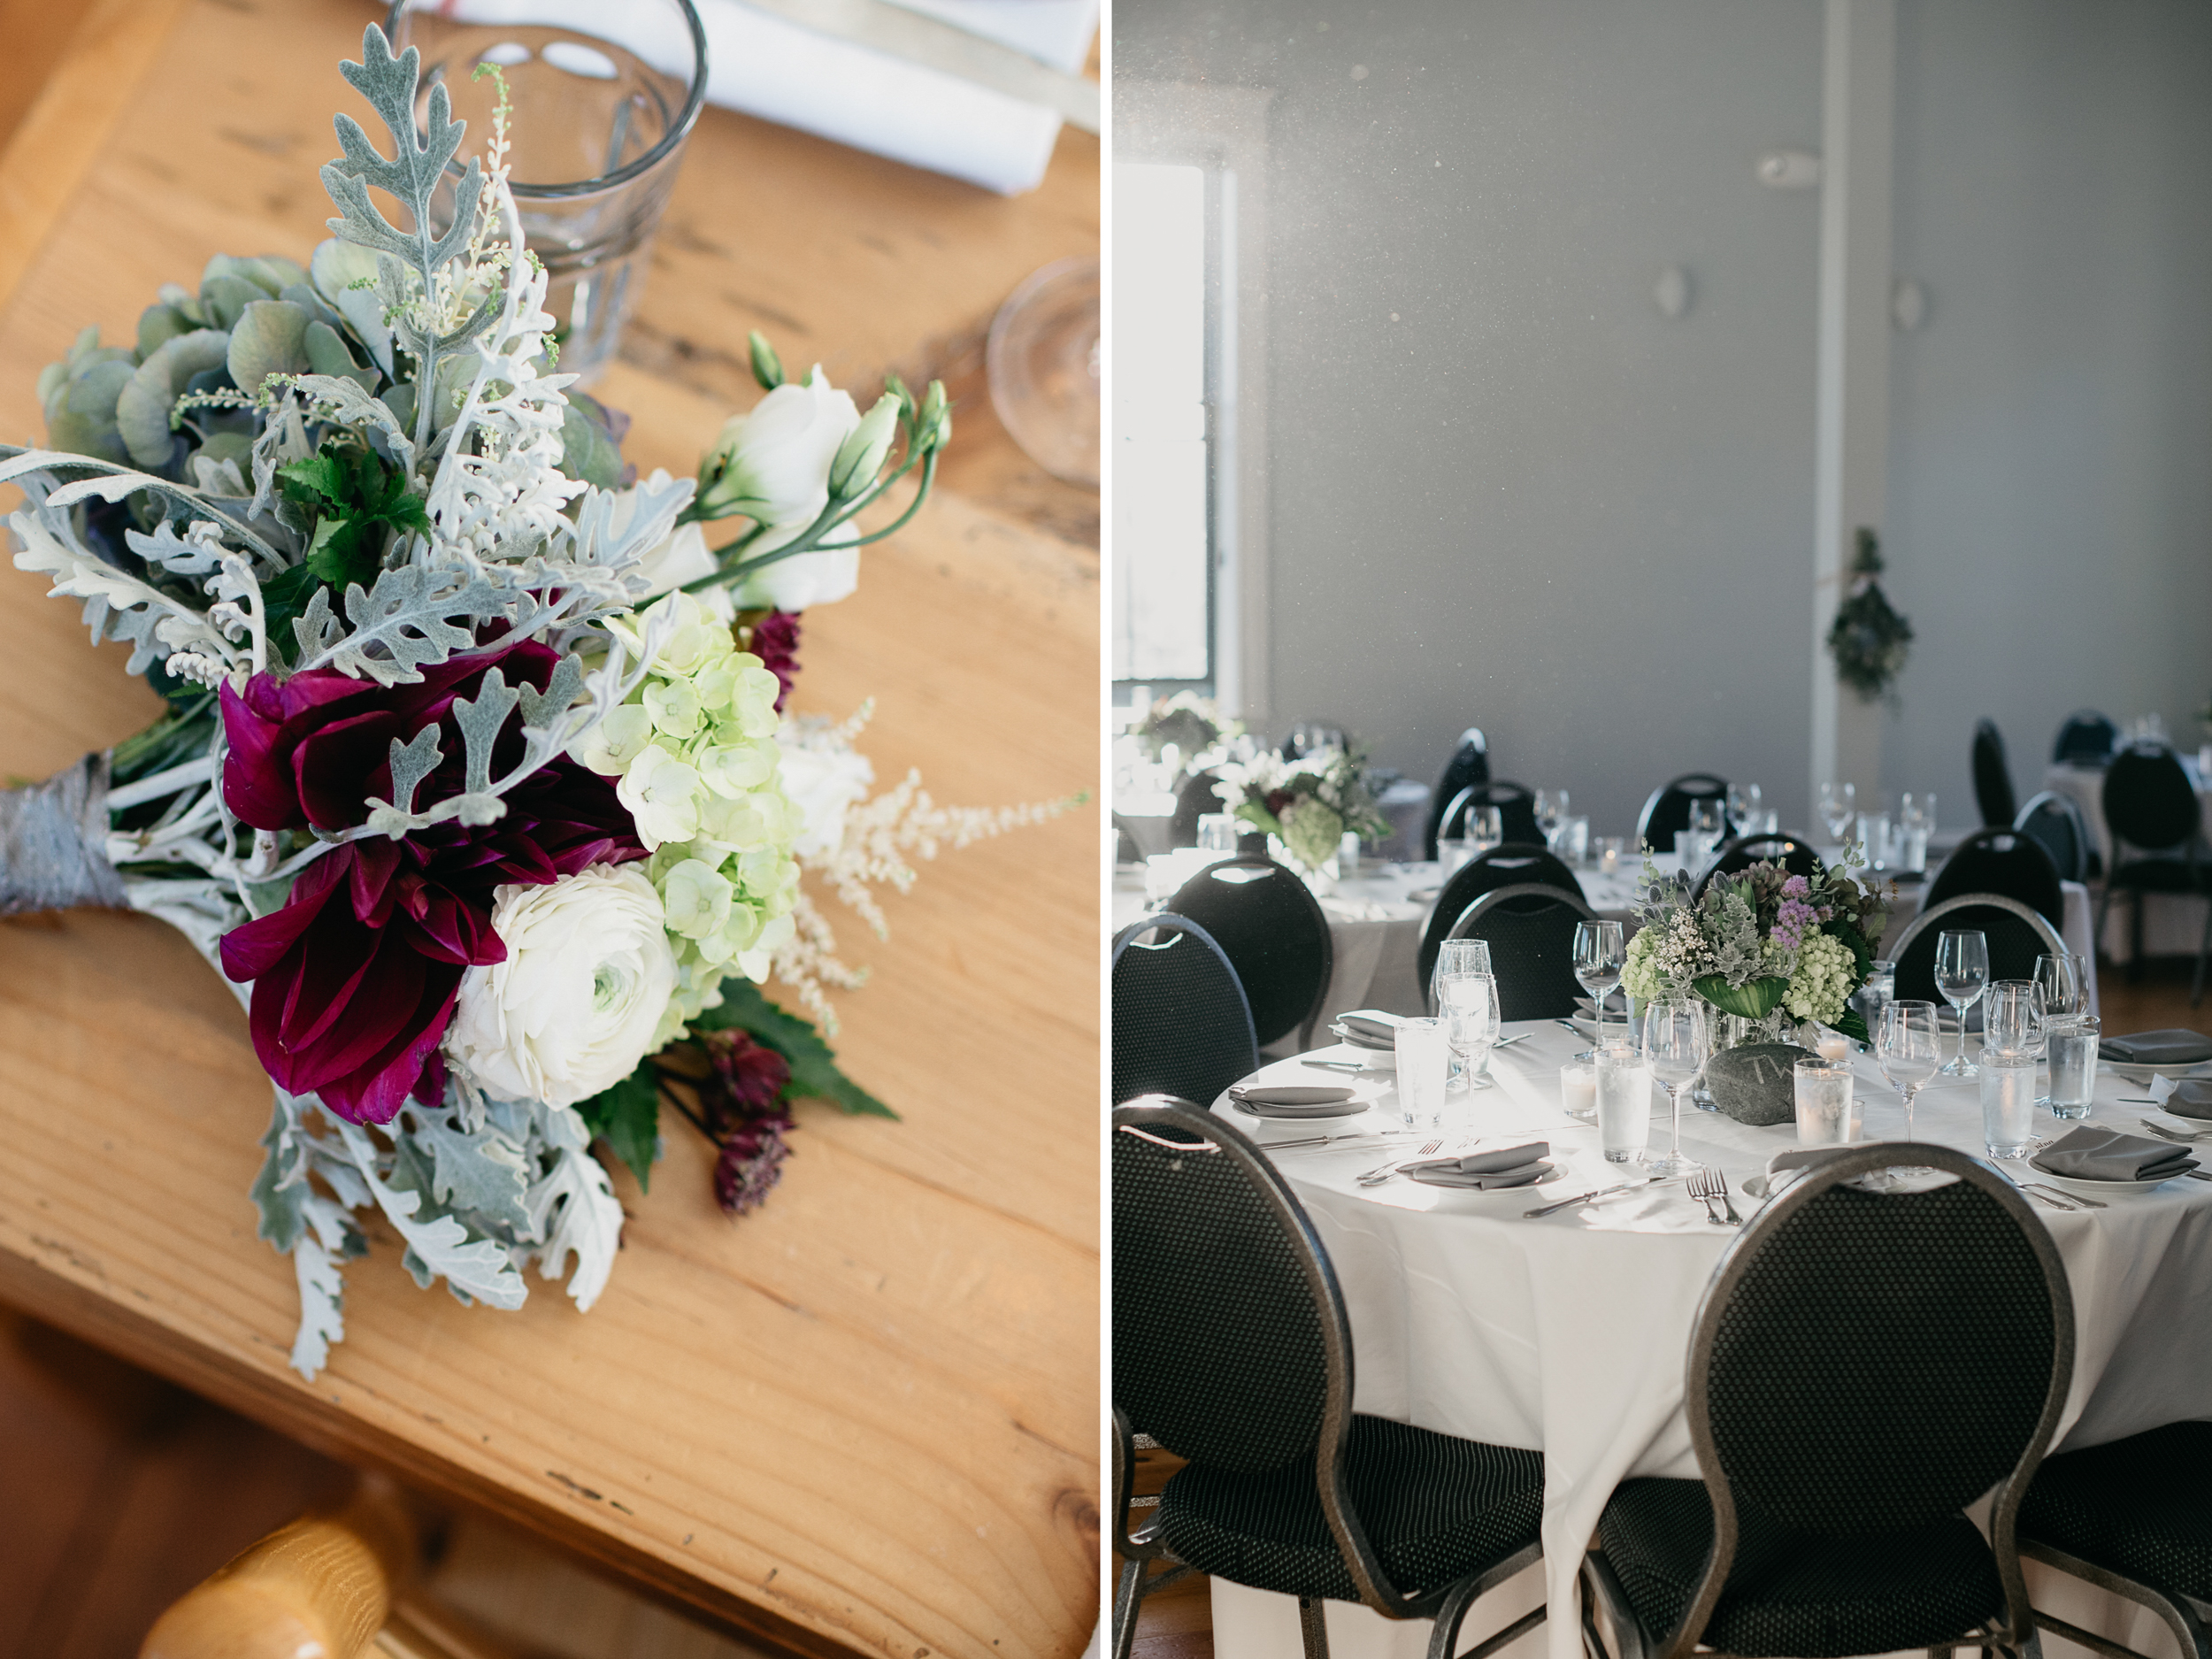 Mackenzie_Collins_Maine_wedding_in_Rockport_Union_hall_Nina_June_023.jpg